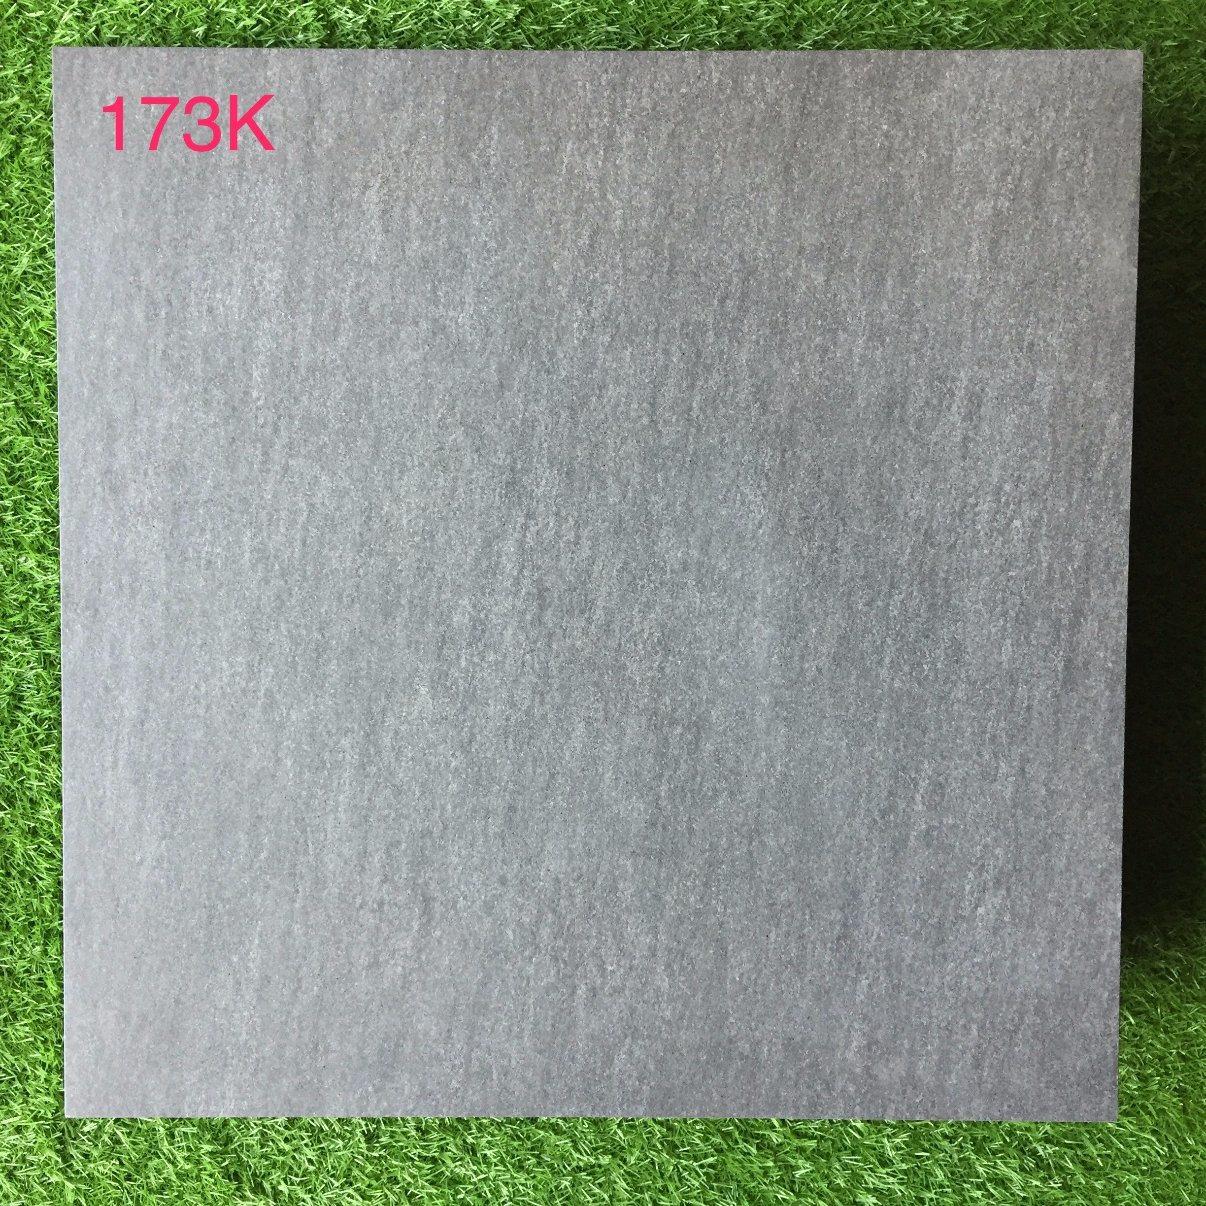 Australia 2cm Ceramic Outdoor Porcelain Tiles 20 Mm Large Grey Somany Plaza Paving Floor